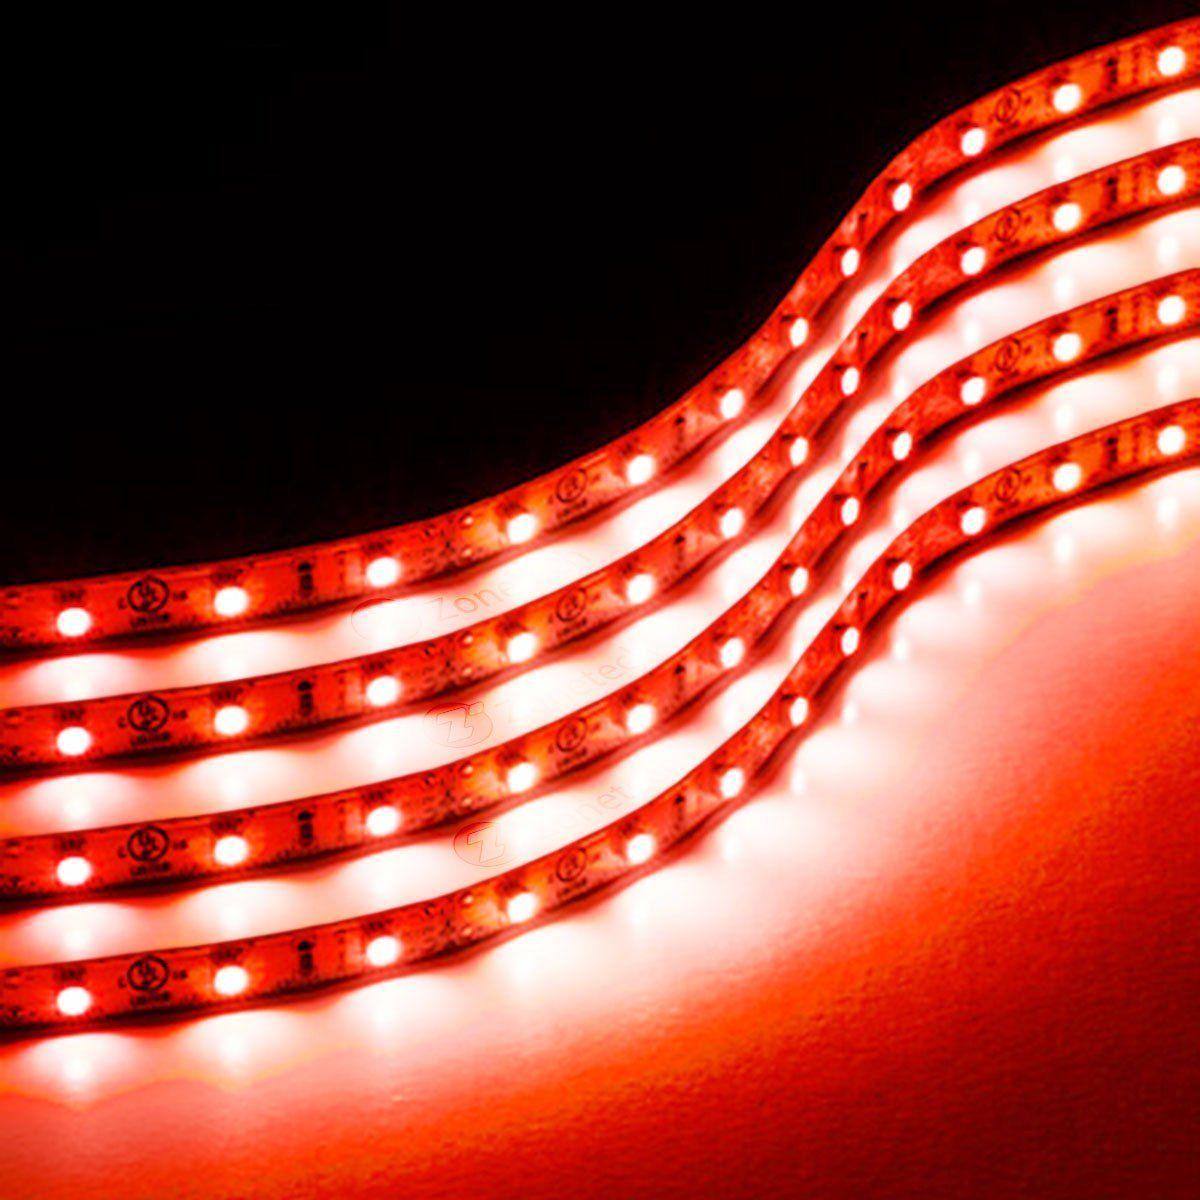 Zone Tech 4x Red 30cm 15 LED Decorative Flexible Waterproof Lighting S